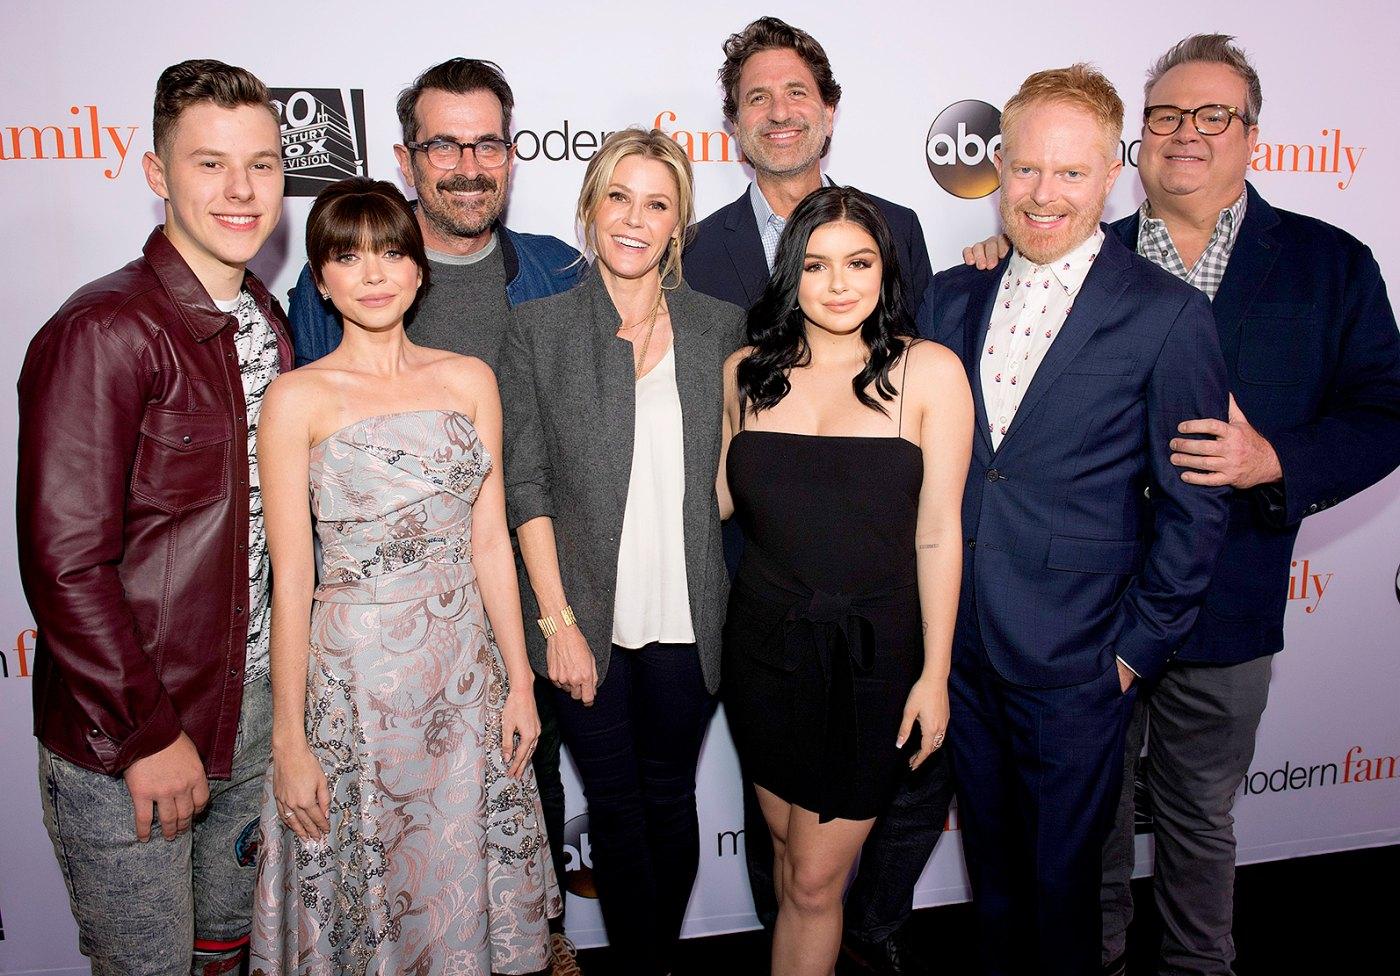 Modern Familys Julie Bowen worships Sofia Vergara